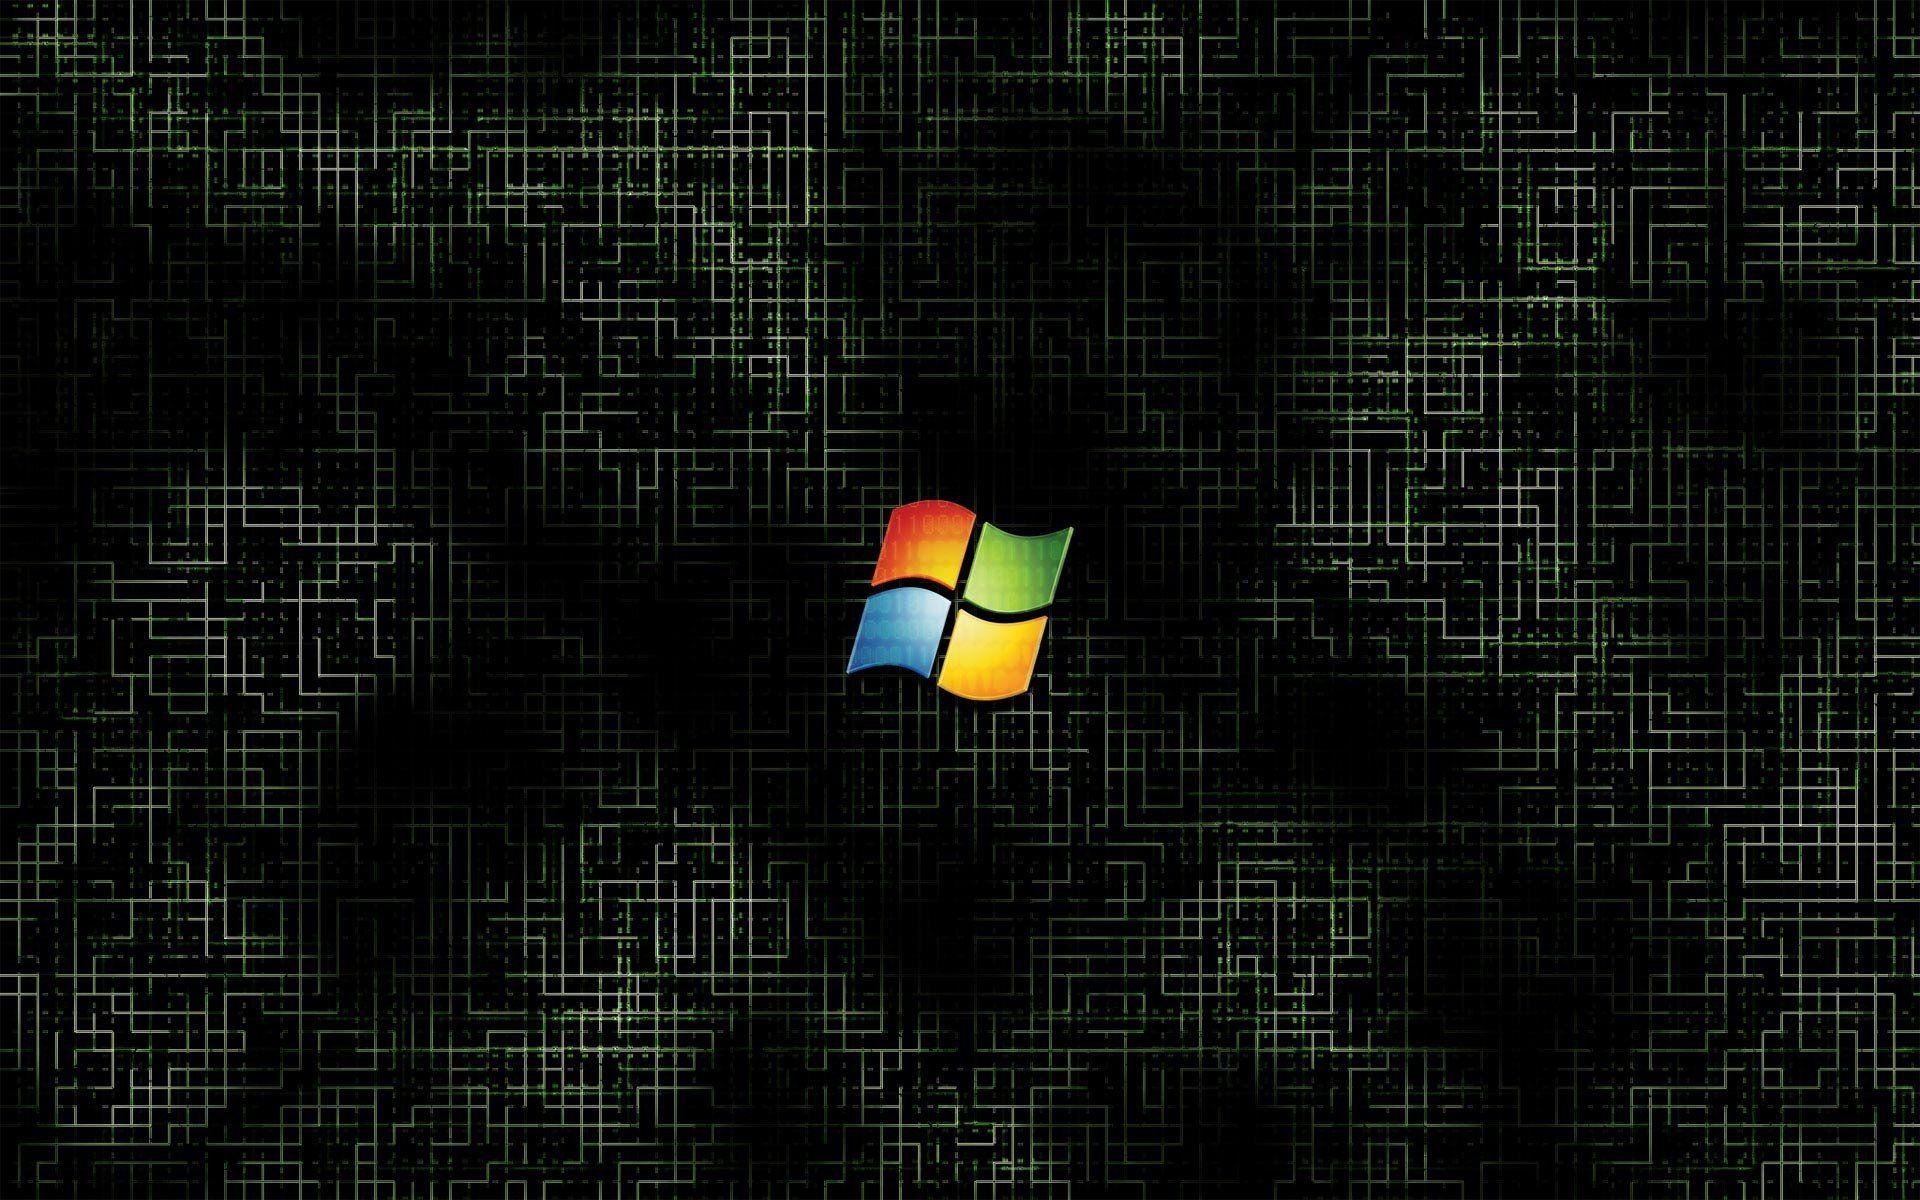 Windows 7 Black 598077 Widescreen Desktop Mobile Iphone